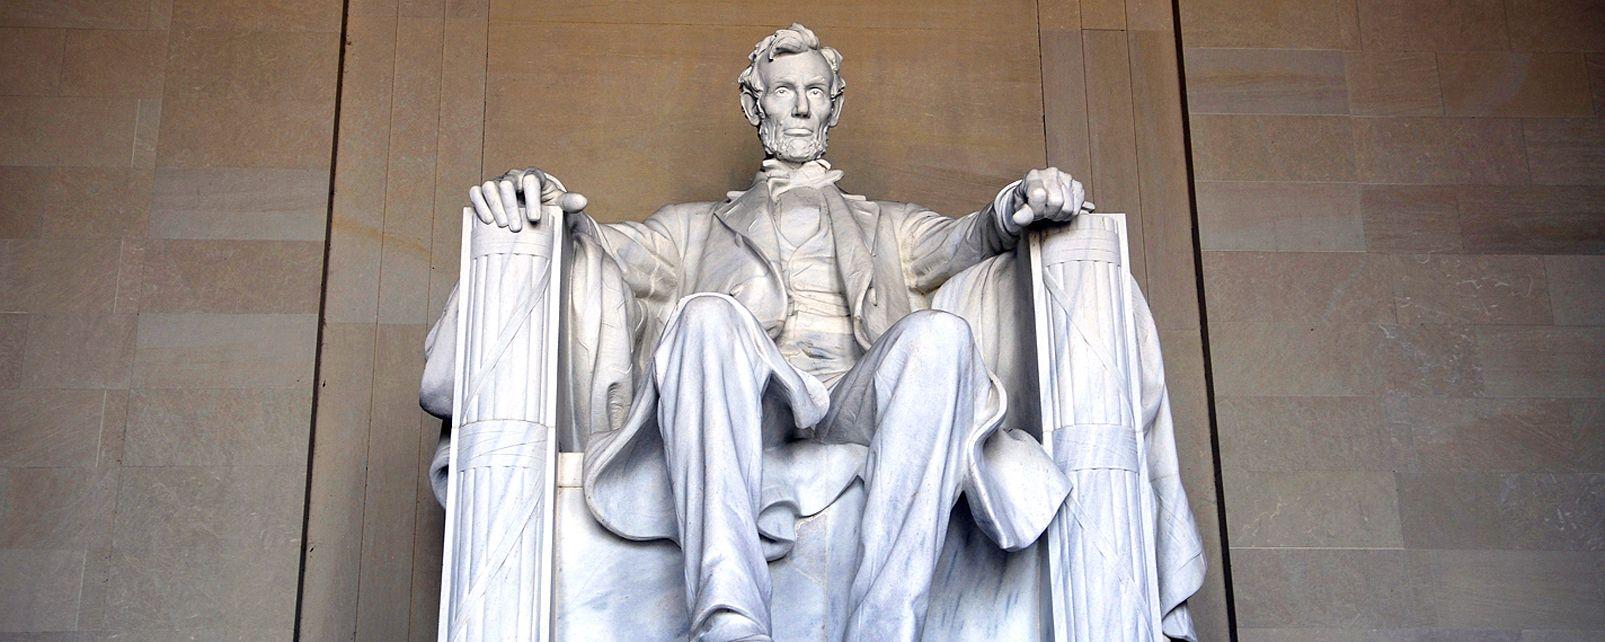 Le Lincoln Memorial , Etats-Unis